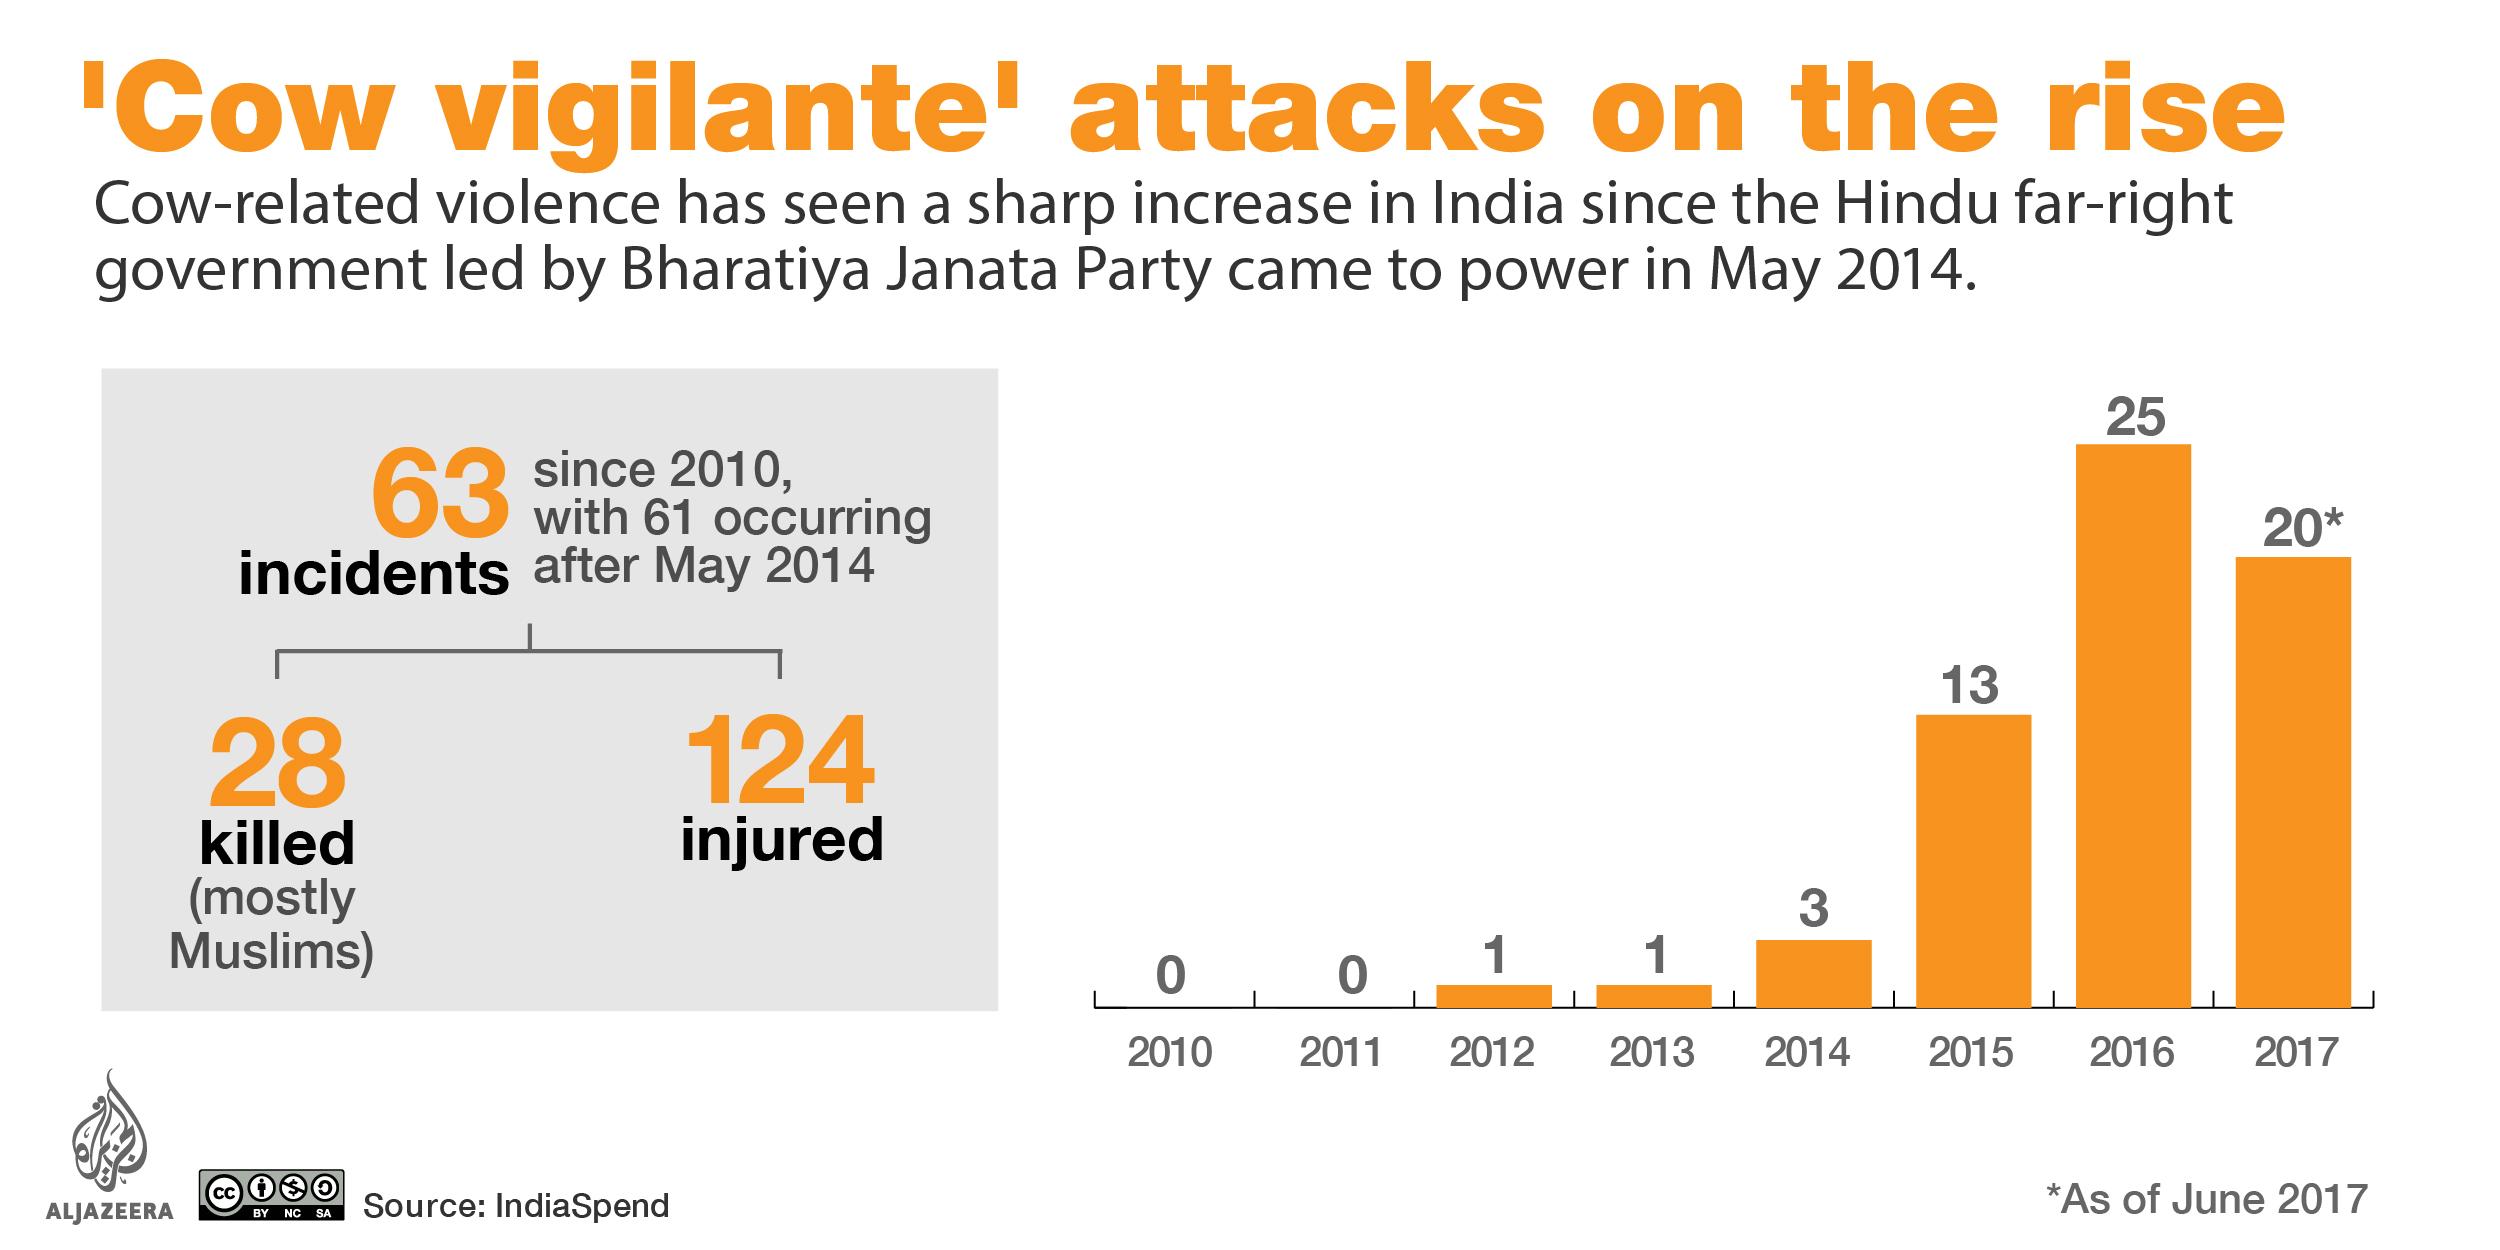 Cow vigilante attacks in India